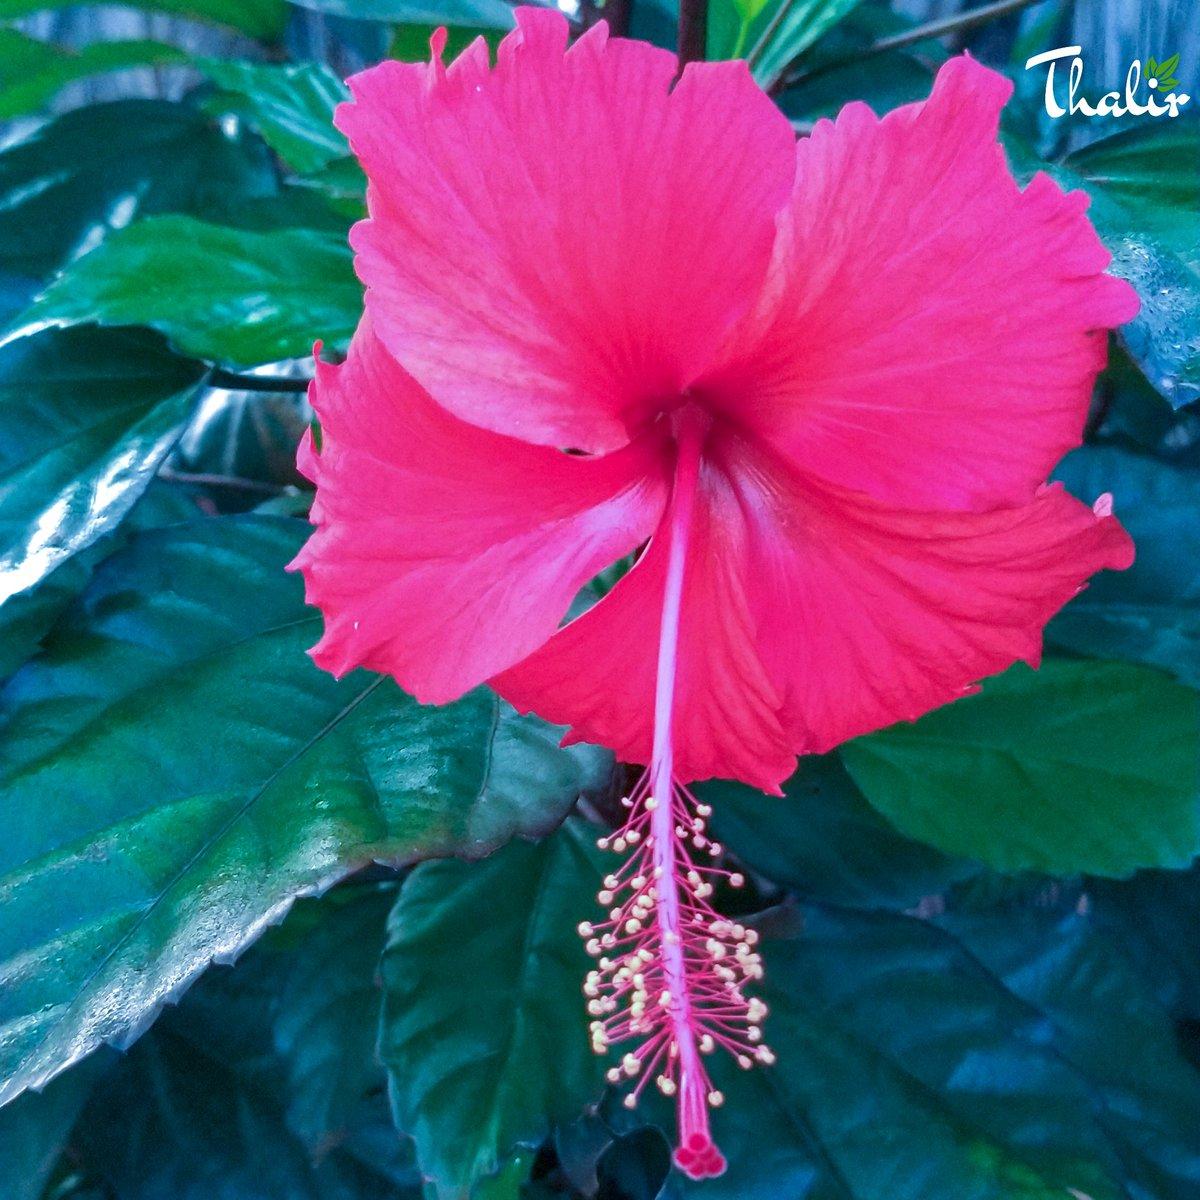 #thalir786 Hibiscus Rosa Sinensis II Pic Courtesy: #teamThalirIndia II Posting: @thalirpics II©2019 @thalirindia II flower Collections #flower #collections #motography #motoonepower #photography #macrophotos #photoexpress @motorolaindia @Photoshoppic.twitter.com/EnrXQ6lhJO